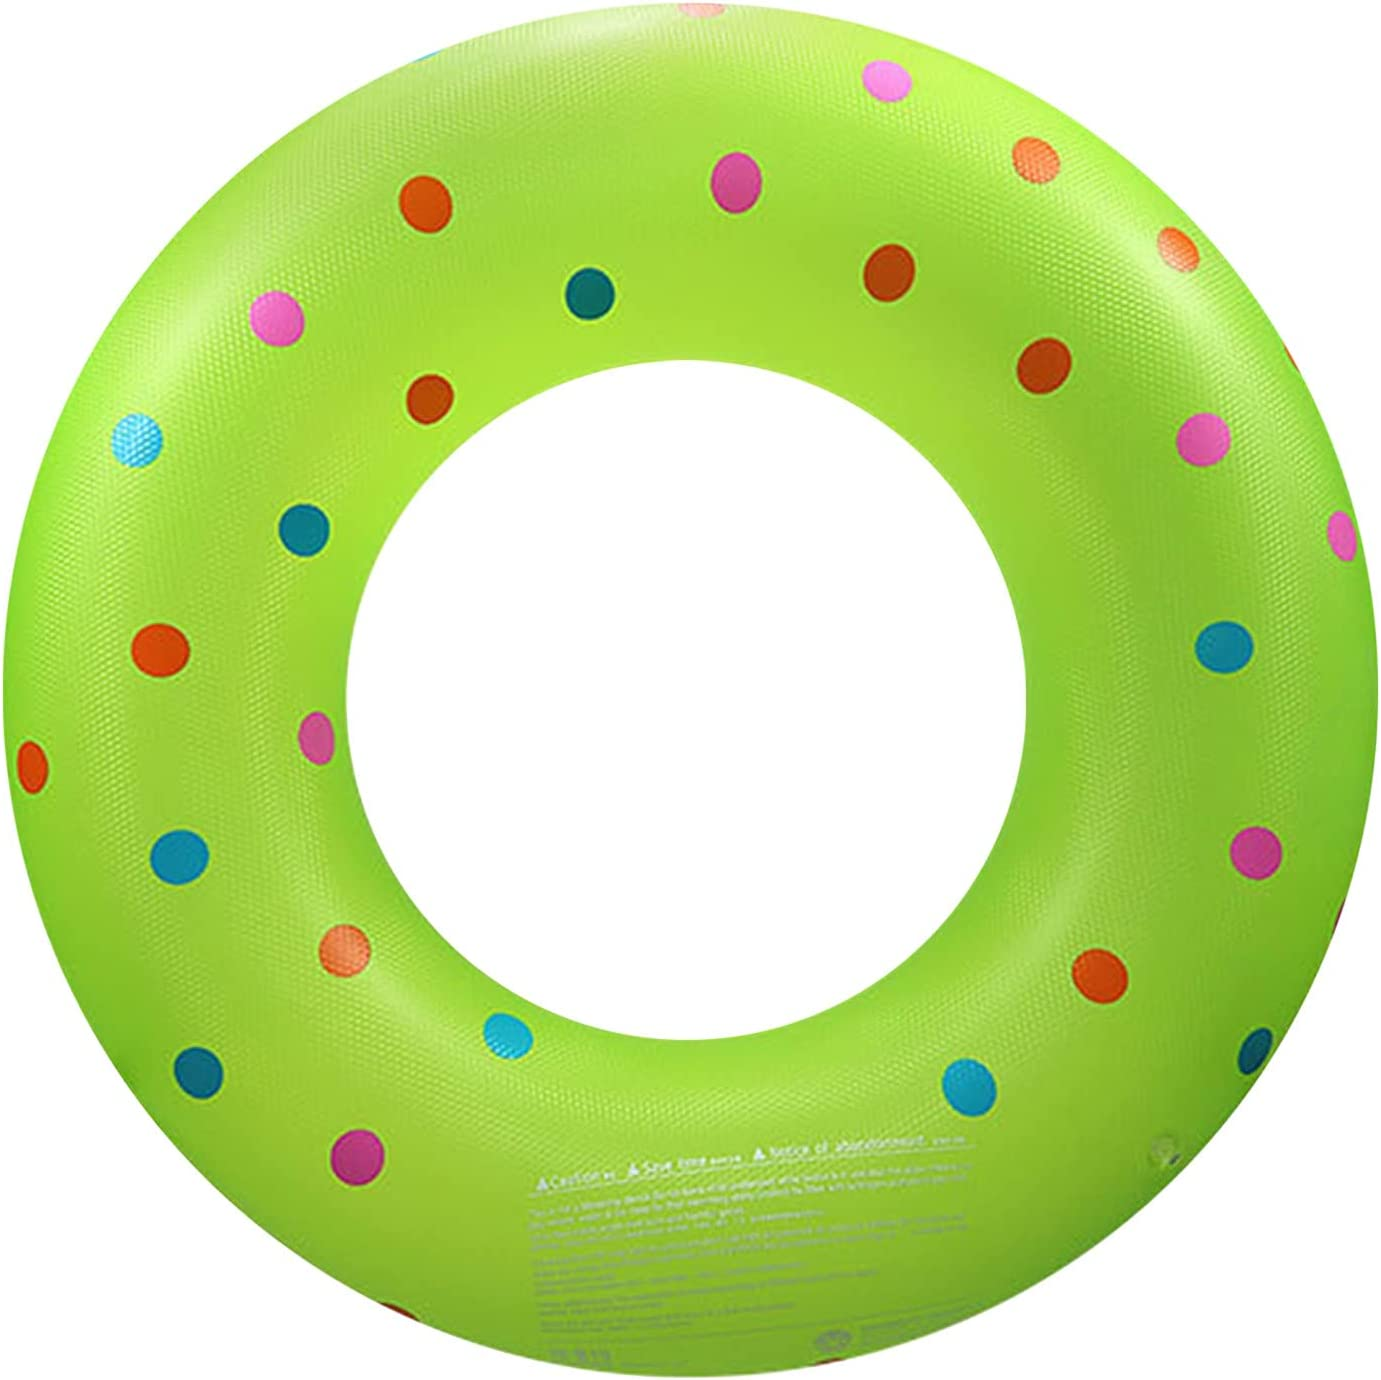 liuliuzuQQ Inflatable Pool Floats Industry No. 1 Swimmin Green Dots Max 89% OFF